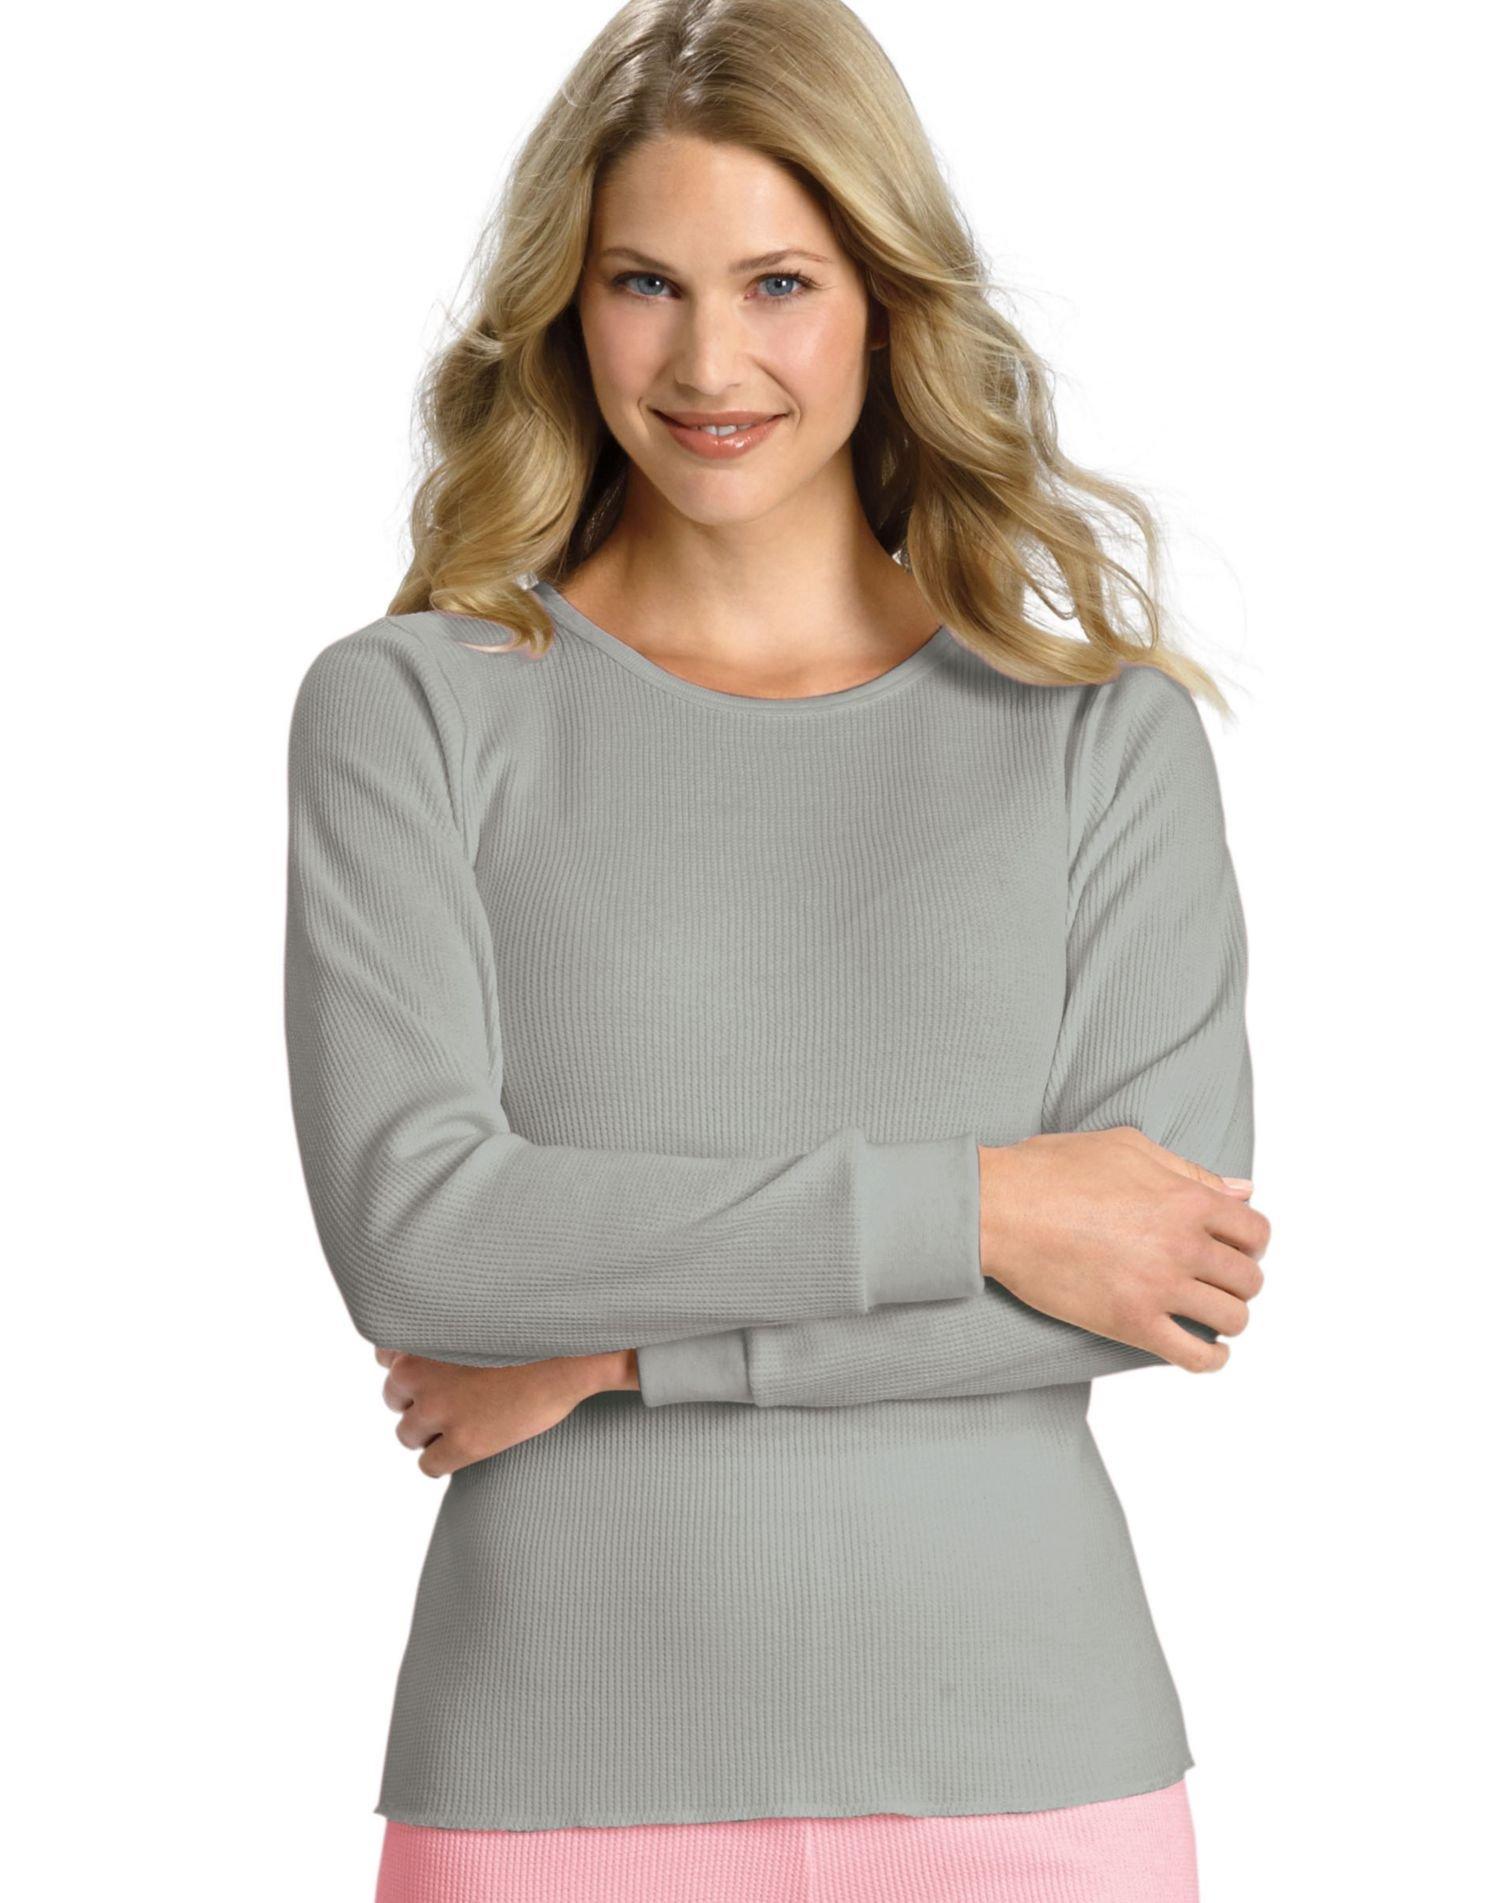 Hanes Women's X-Temp Thermal Underwear Crew Shirt, Heather Grey, Small